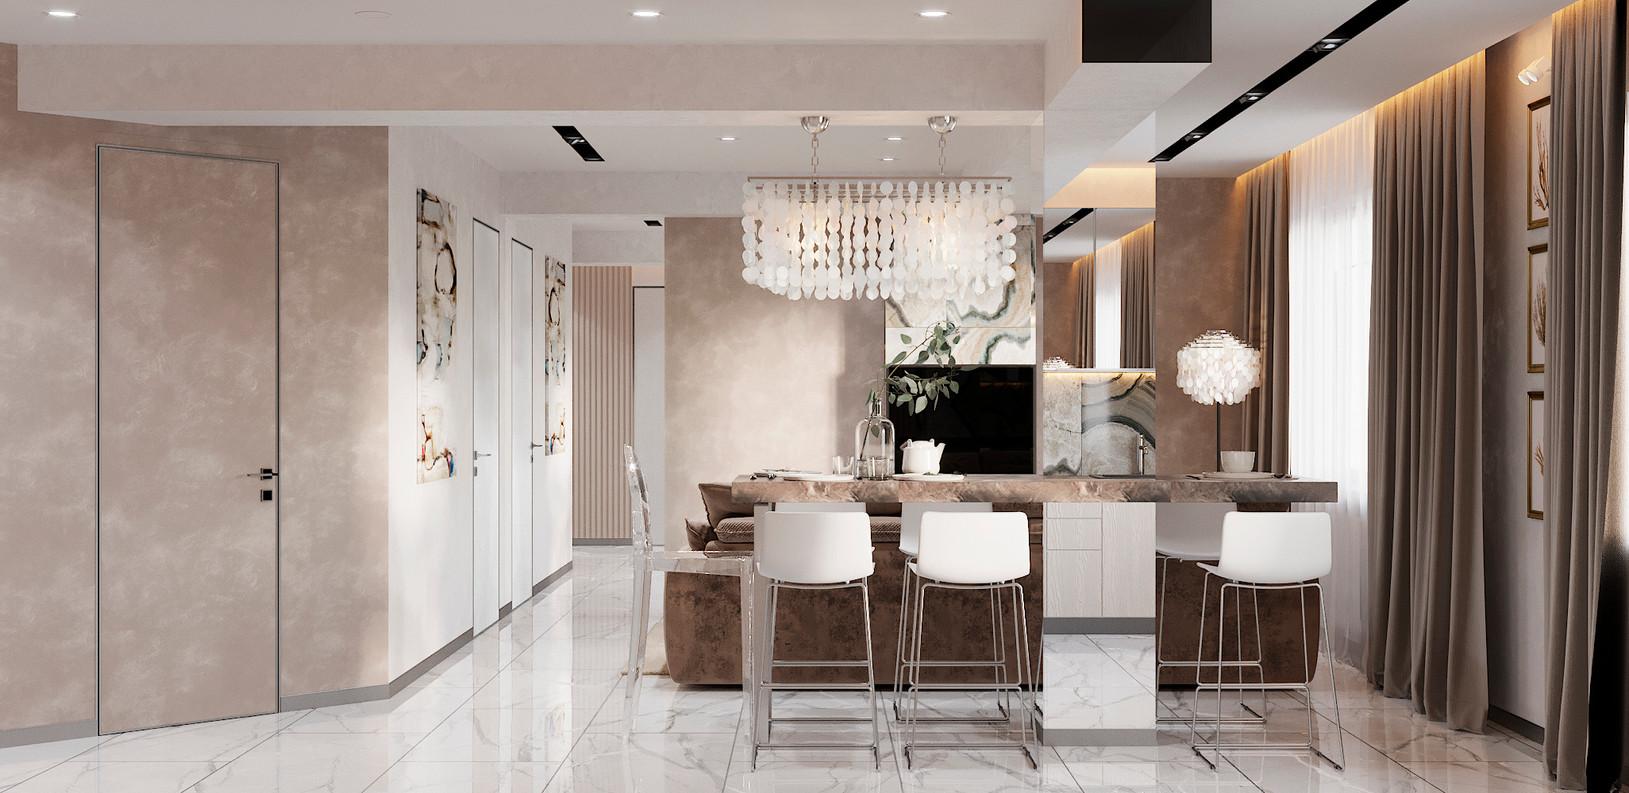 пудровая гостная дизайн